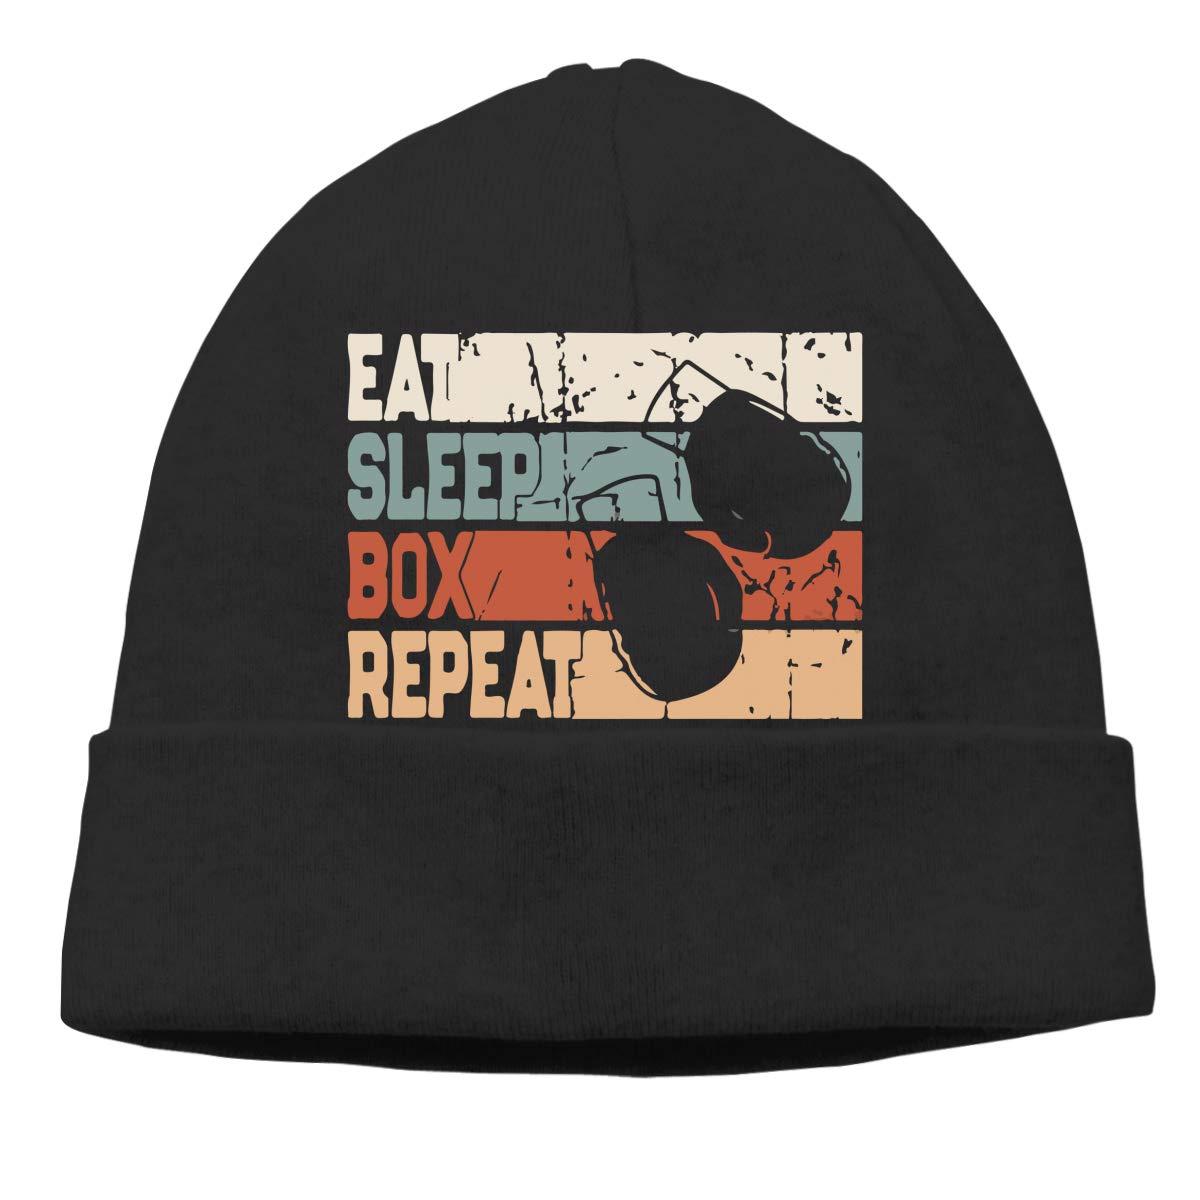 Eat Sleep Box Men Women Great Thermal Sports Beanie Skull Cap